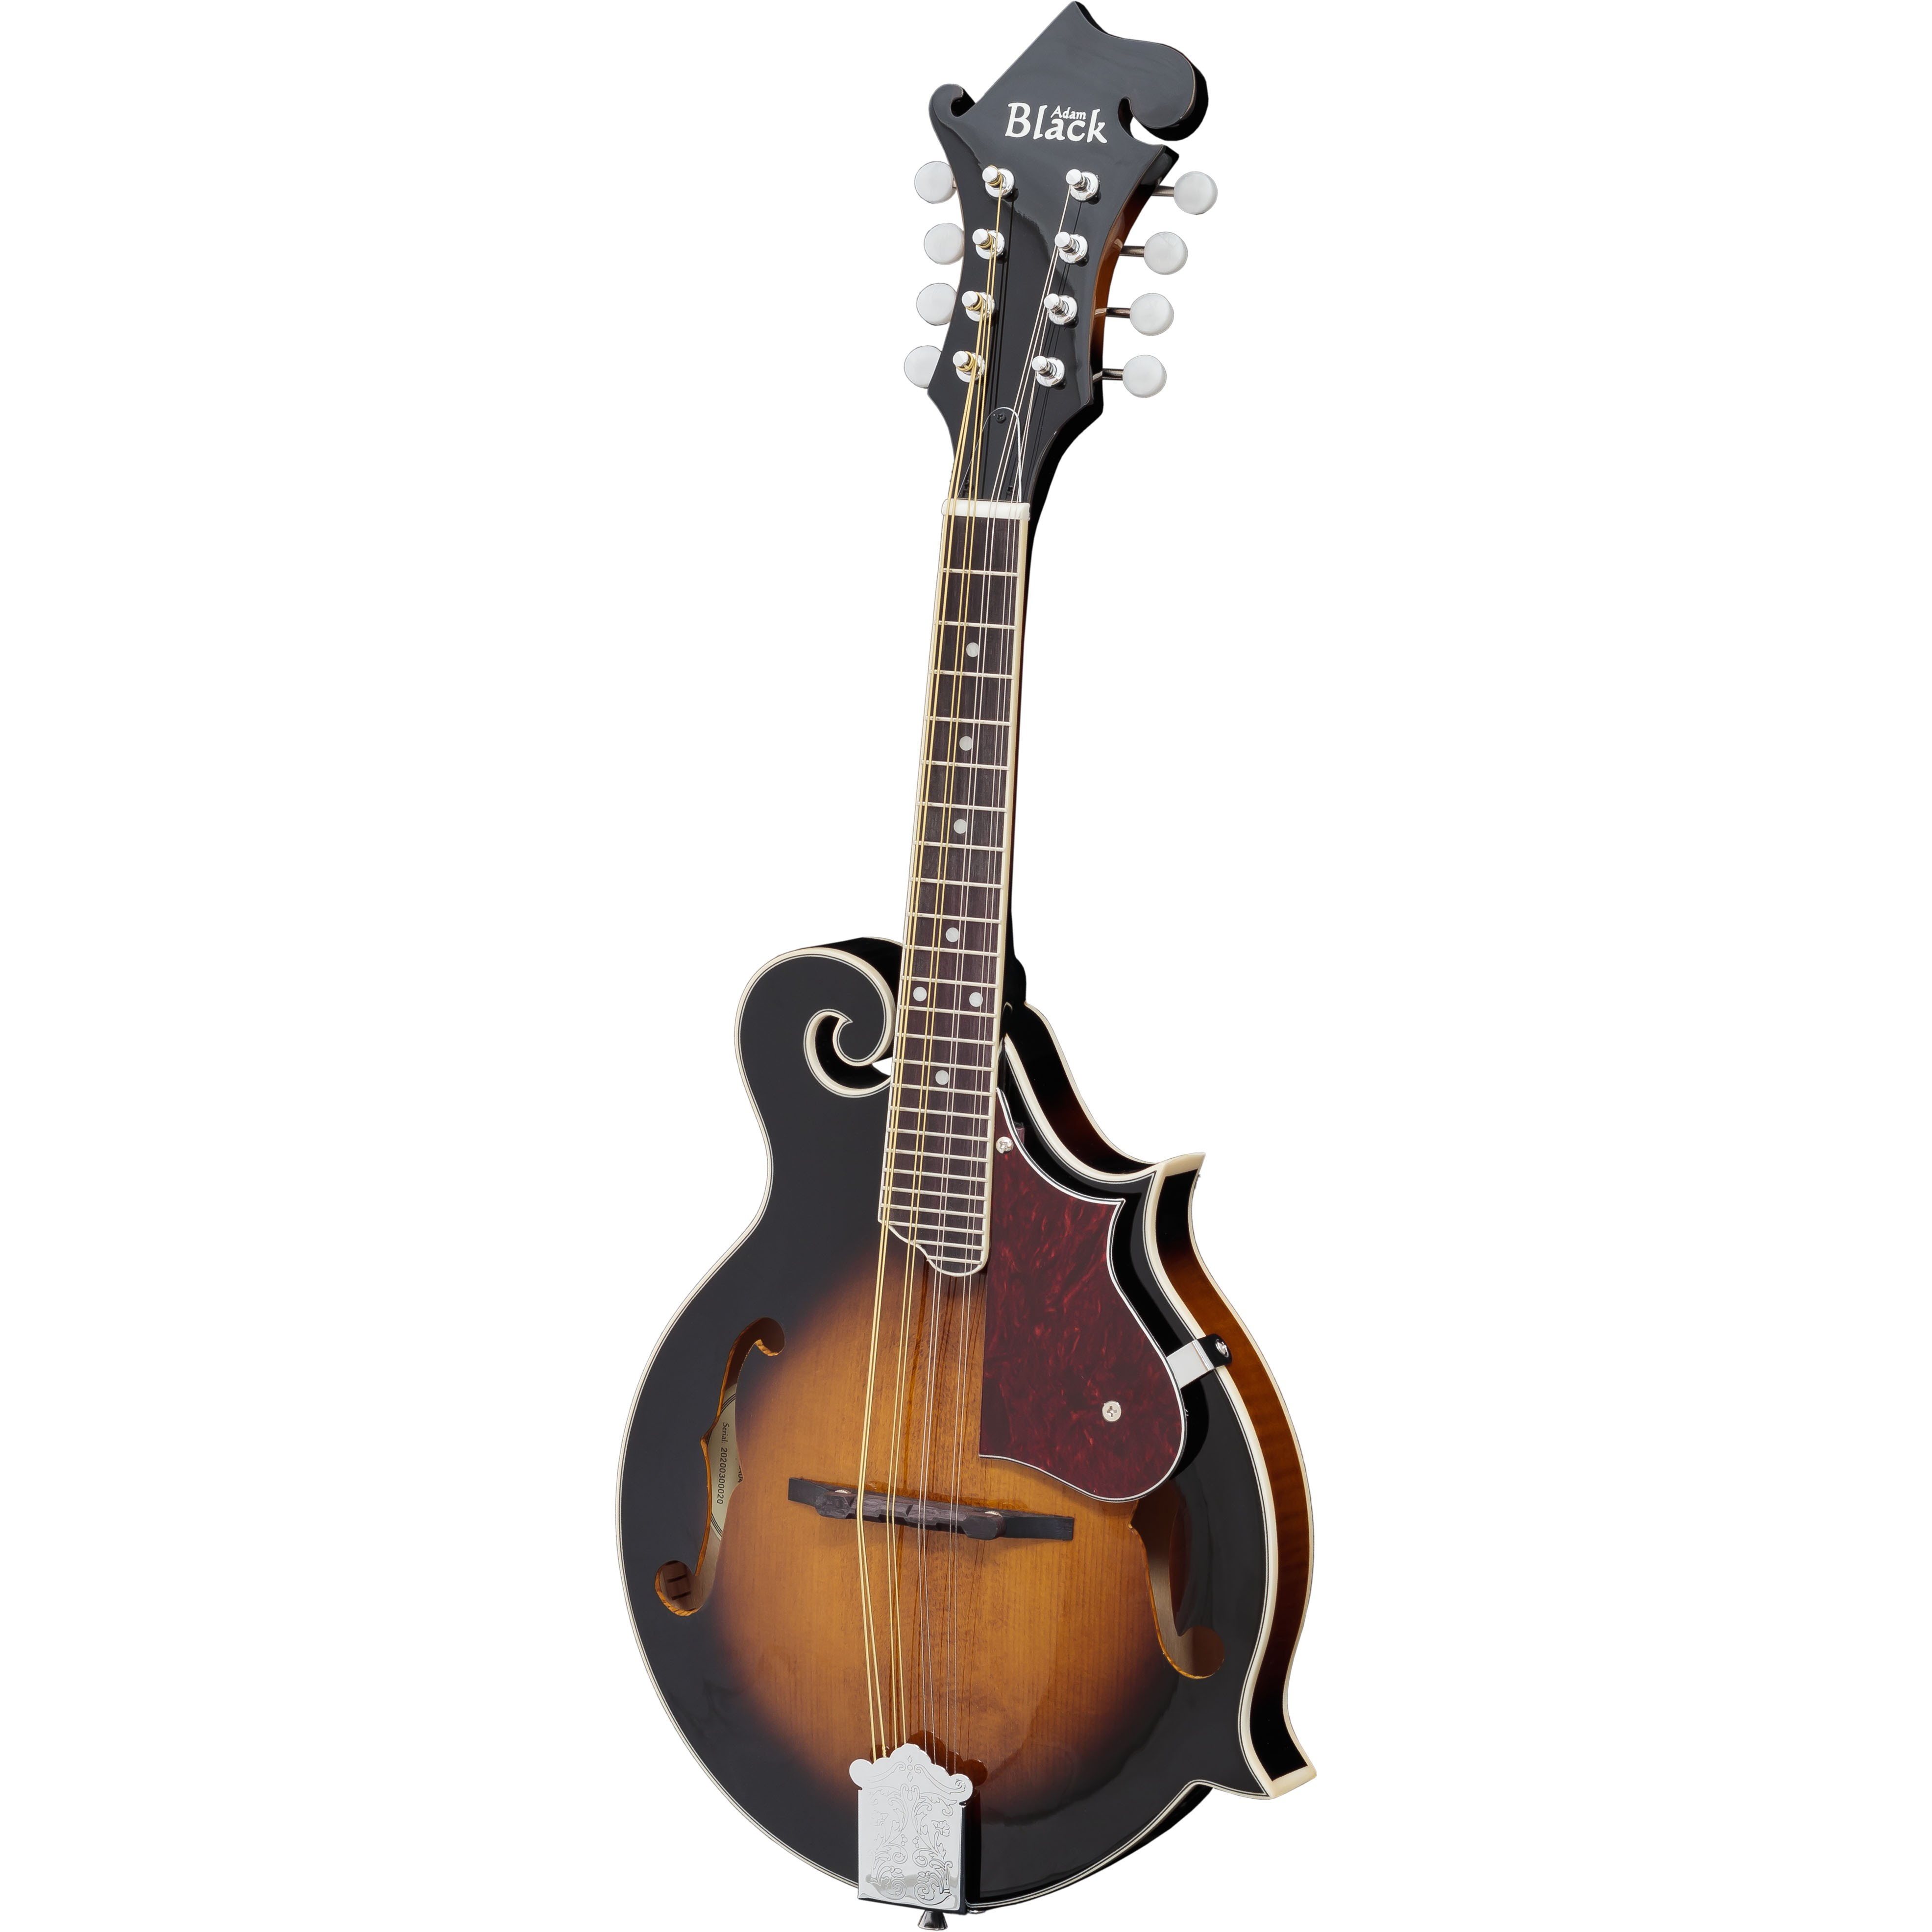 Adam Black MA-04 F-Style Scroll Mandolin with Gigbag - Vintage Sunburst